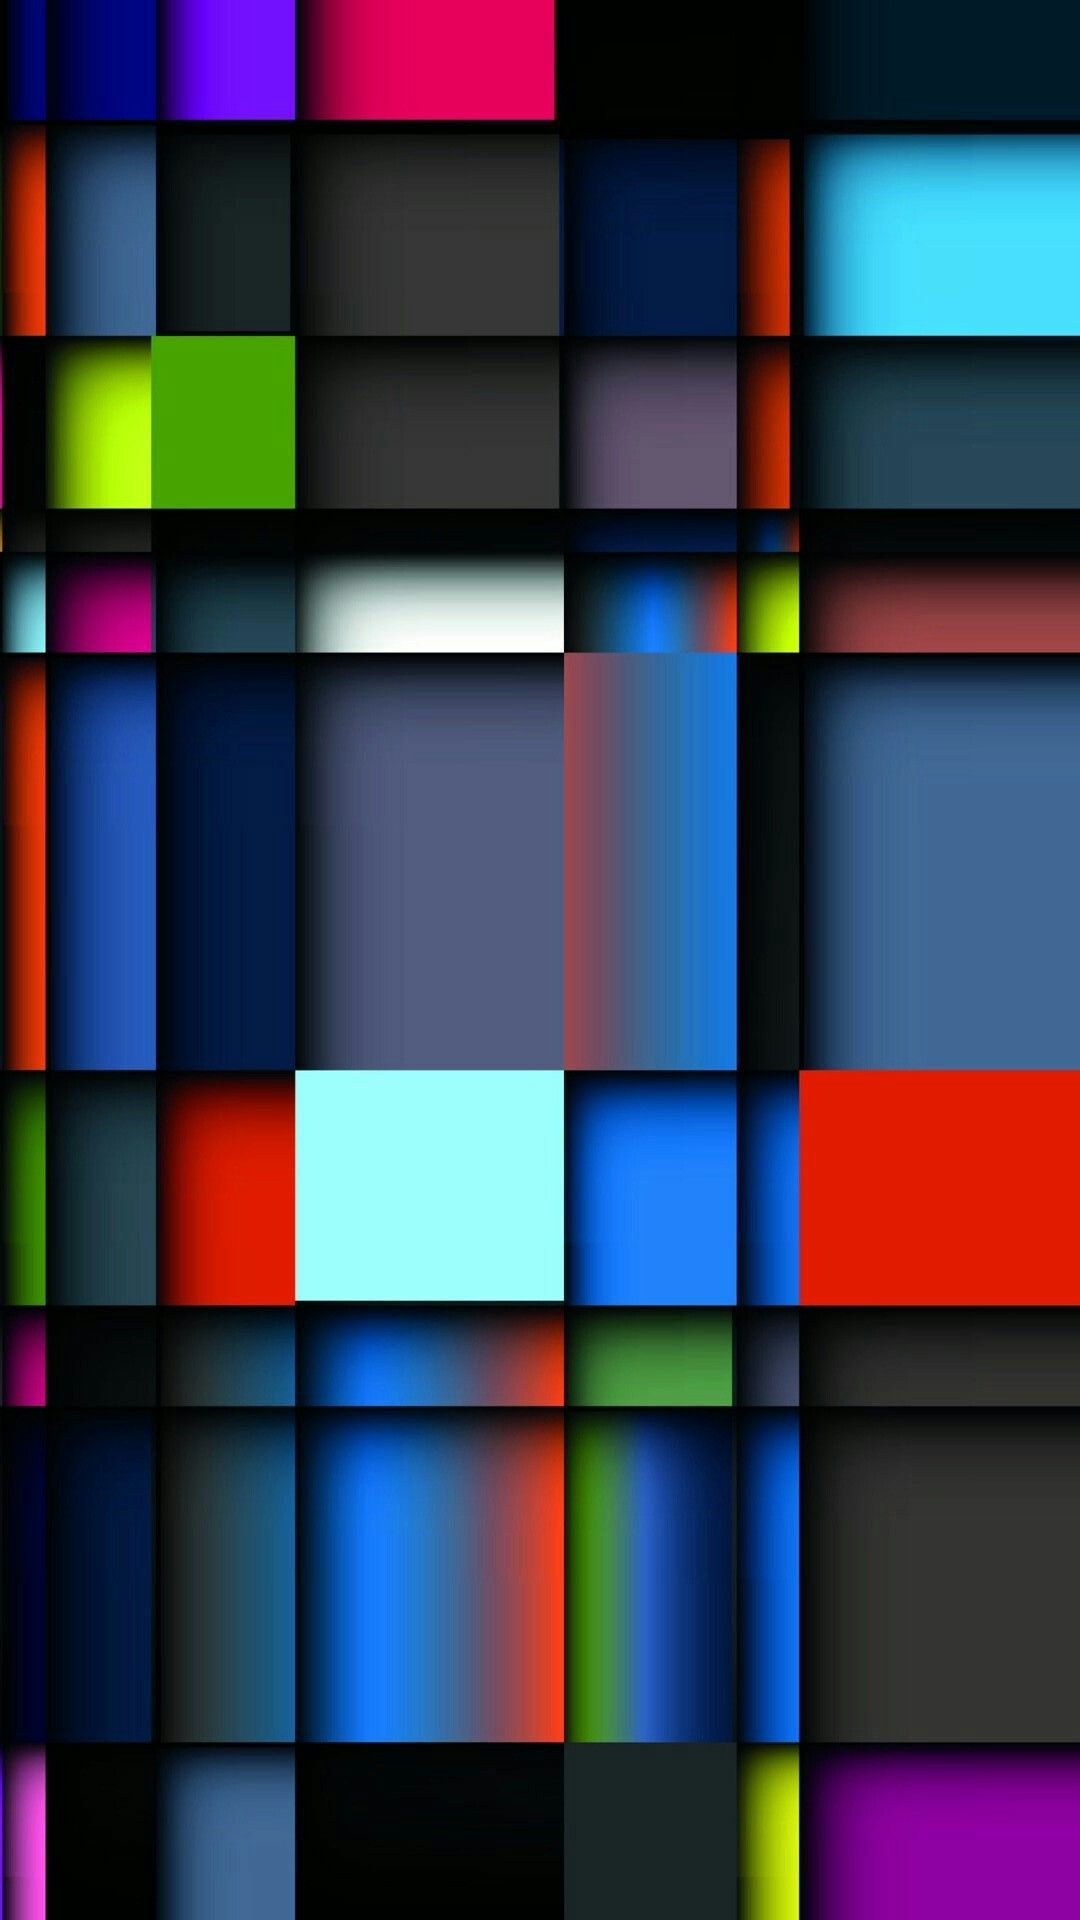 Wallpaper iphone geometric - Colorful Geometric Wallpaper